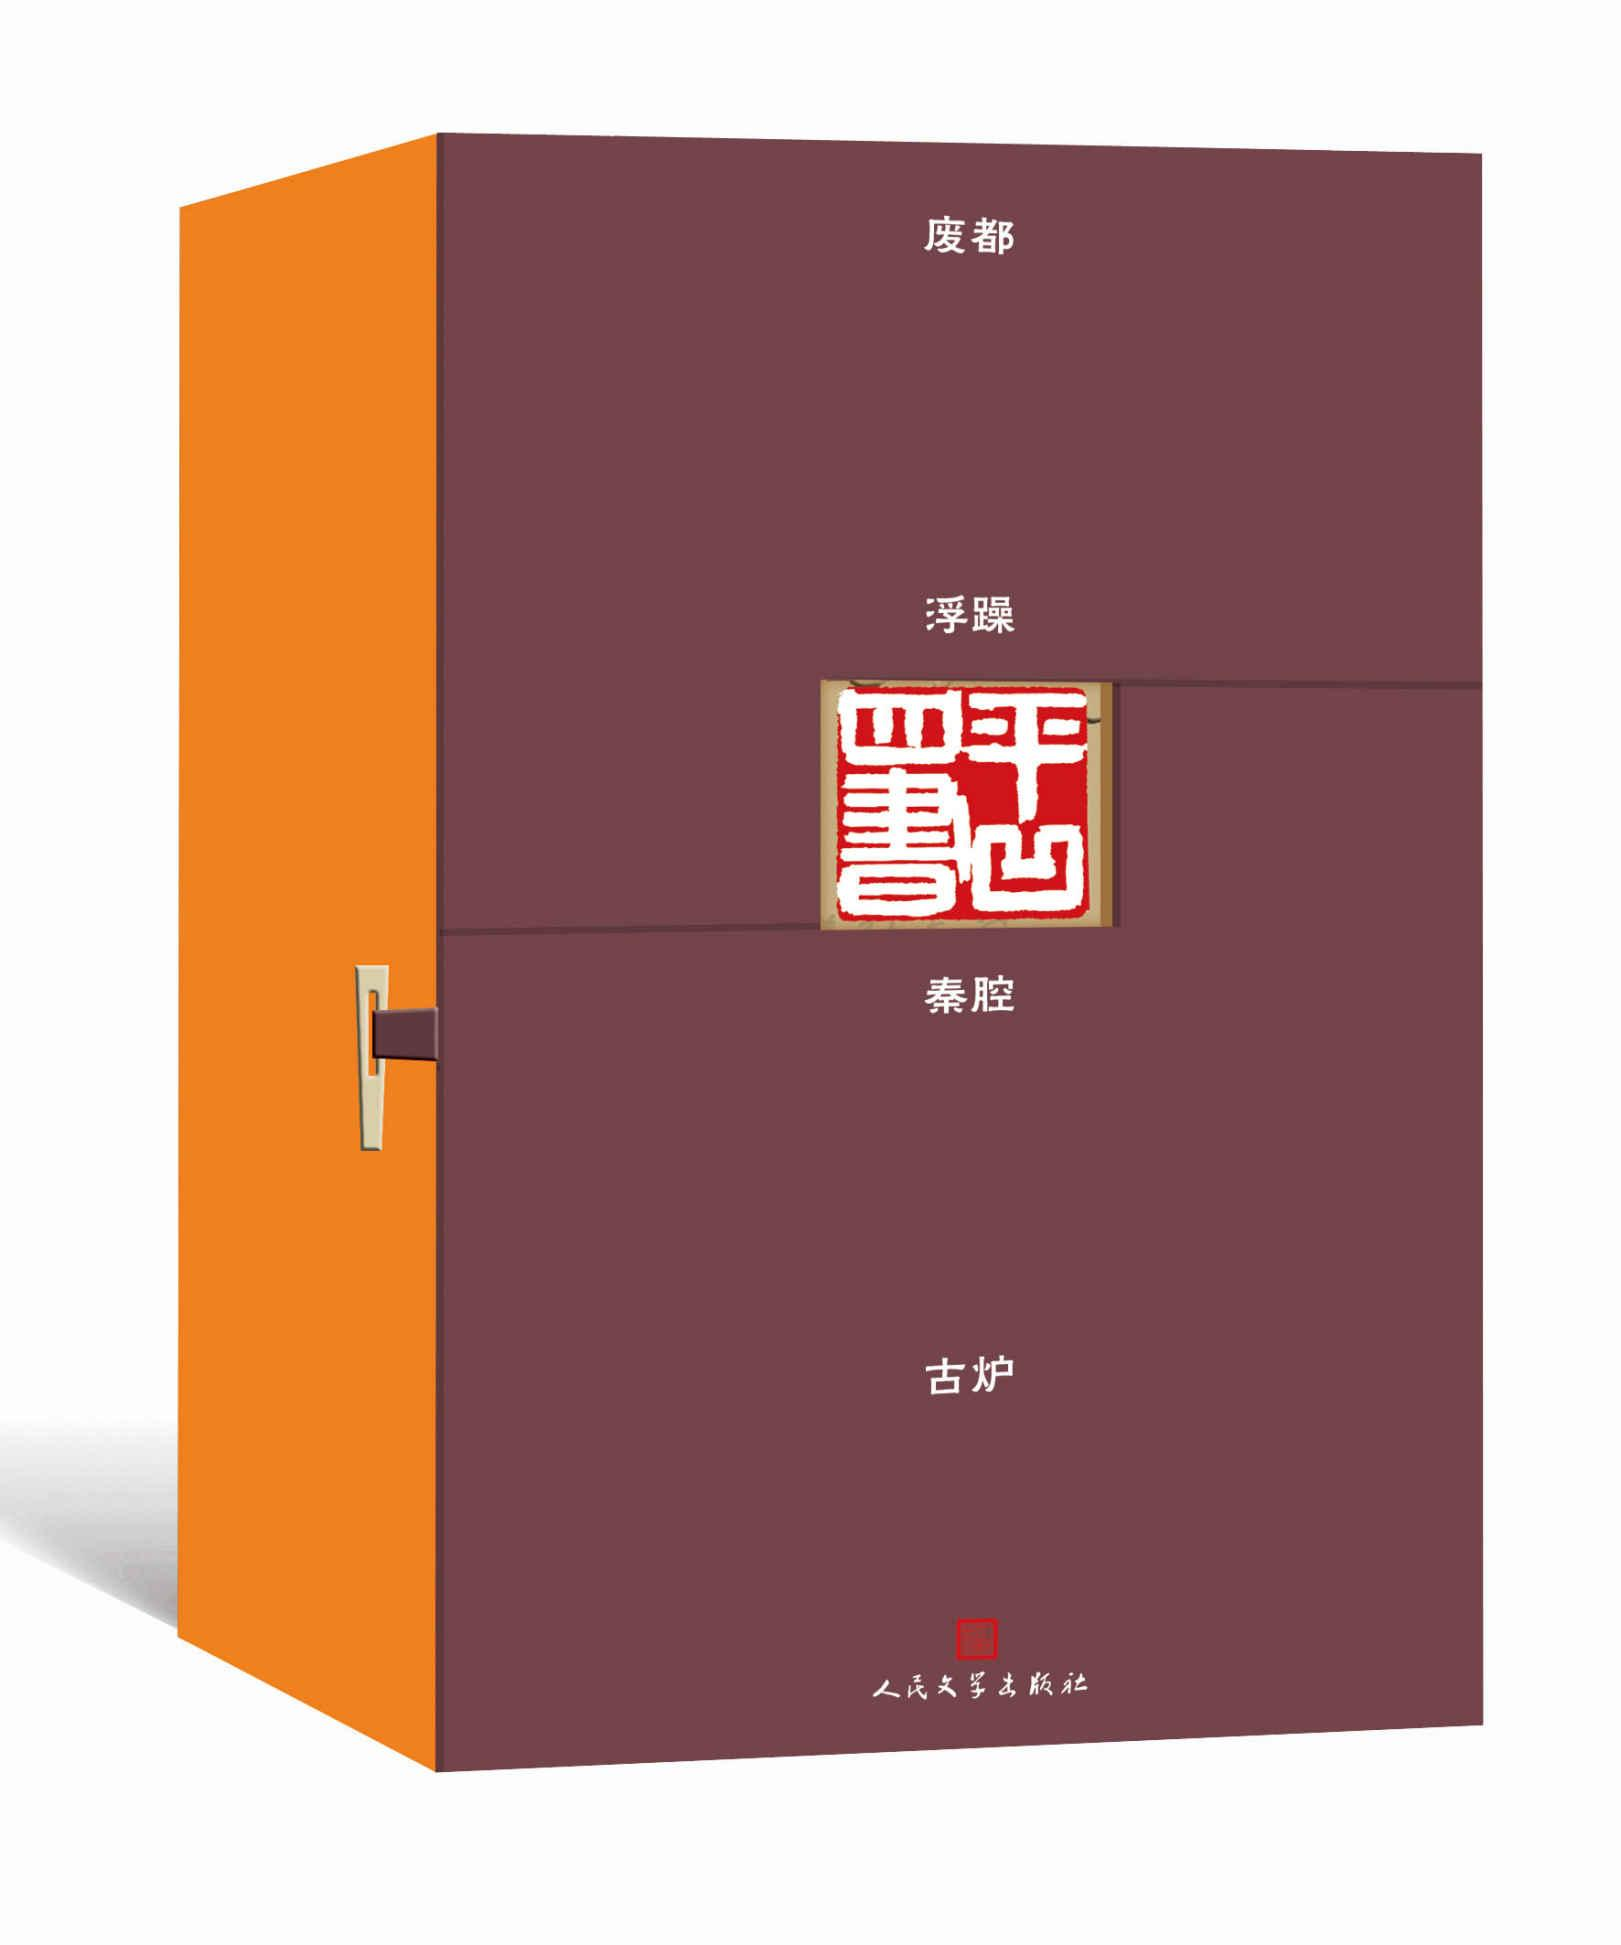 平凹四书 pdf-epub-mobi-txt-azw3